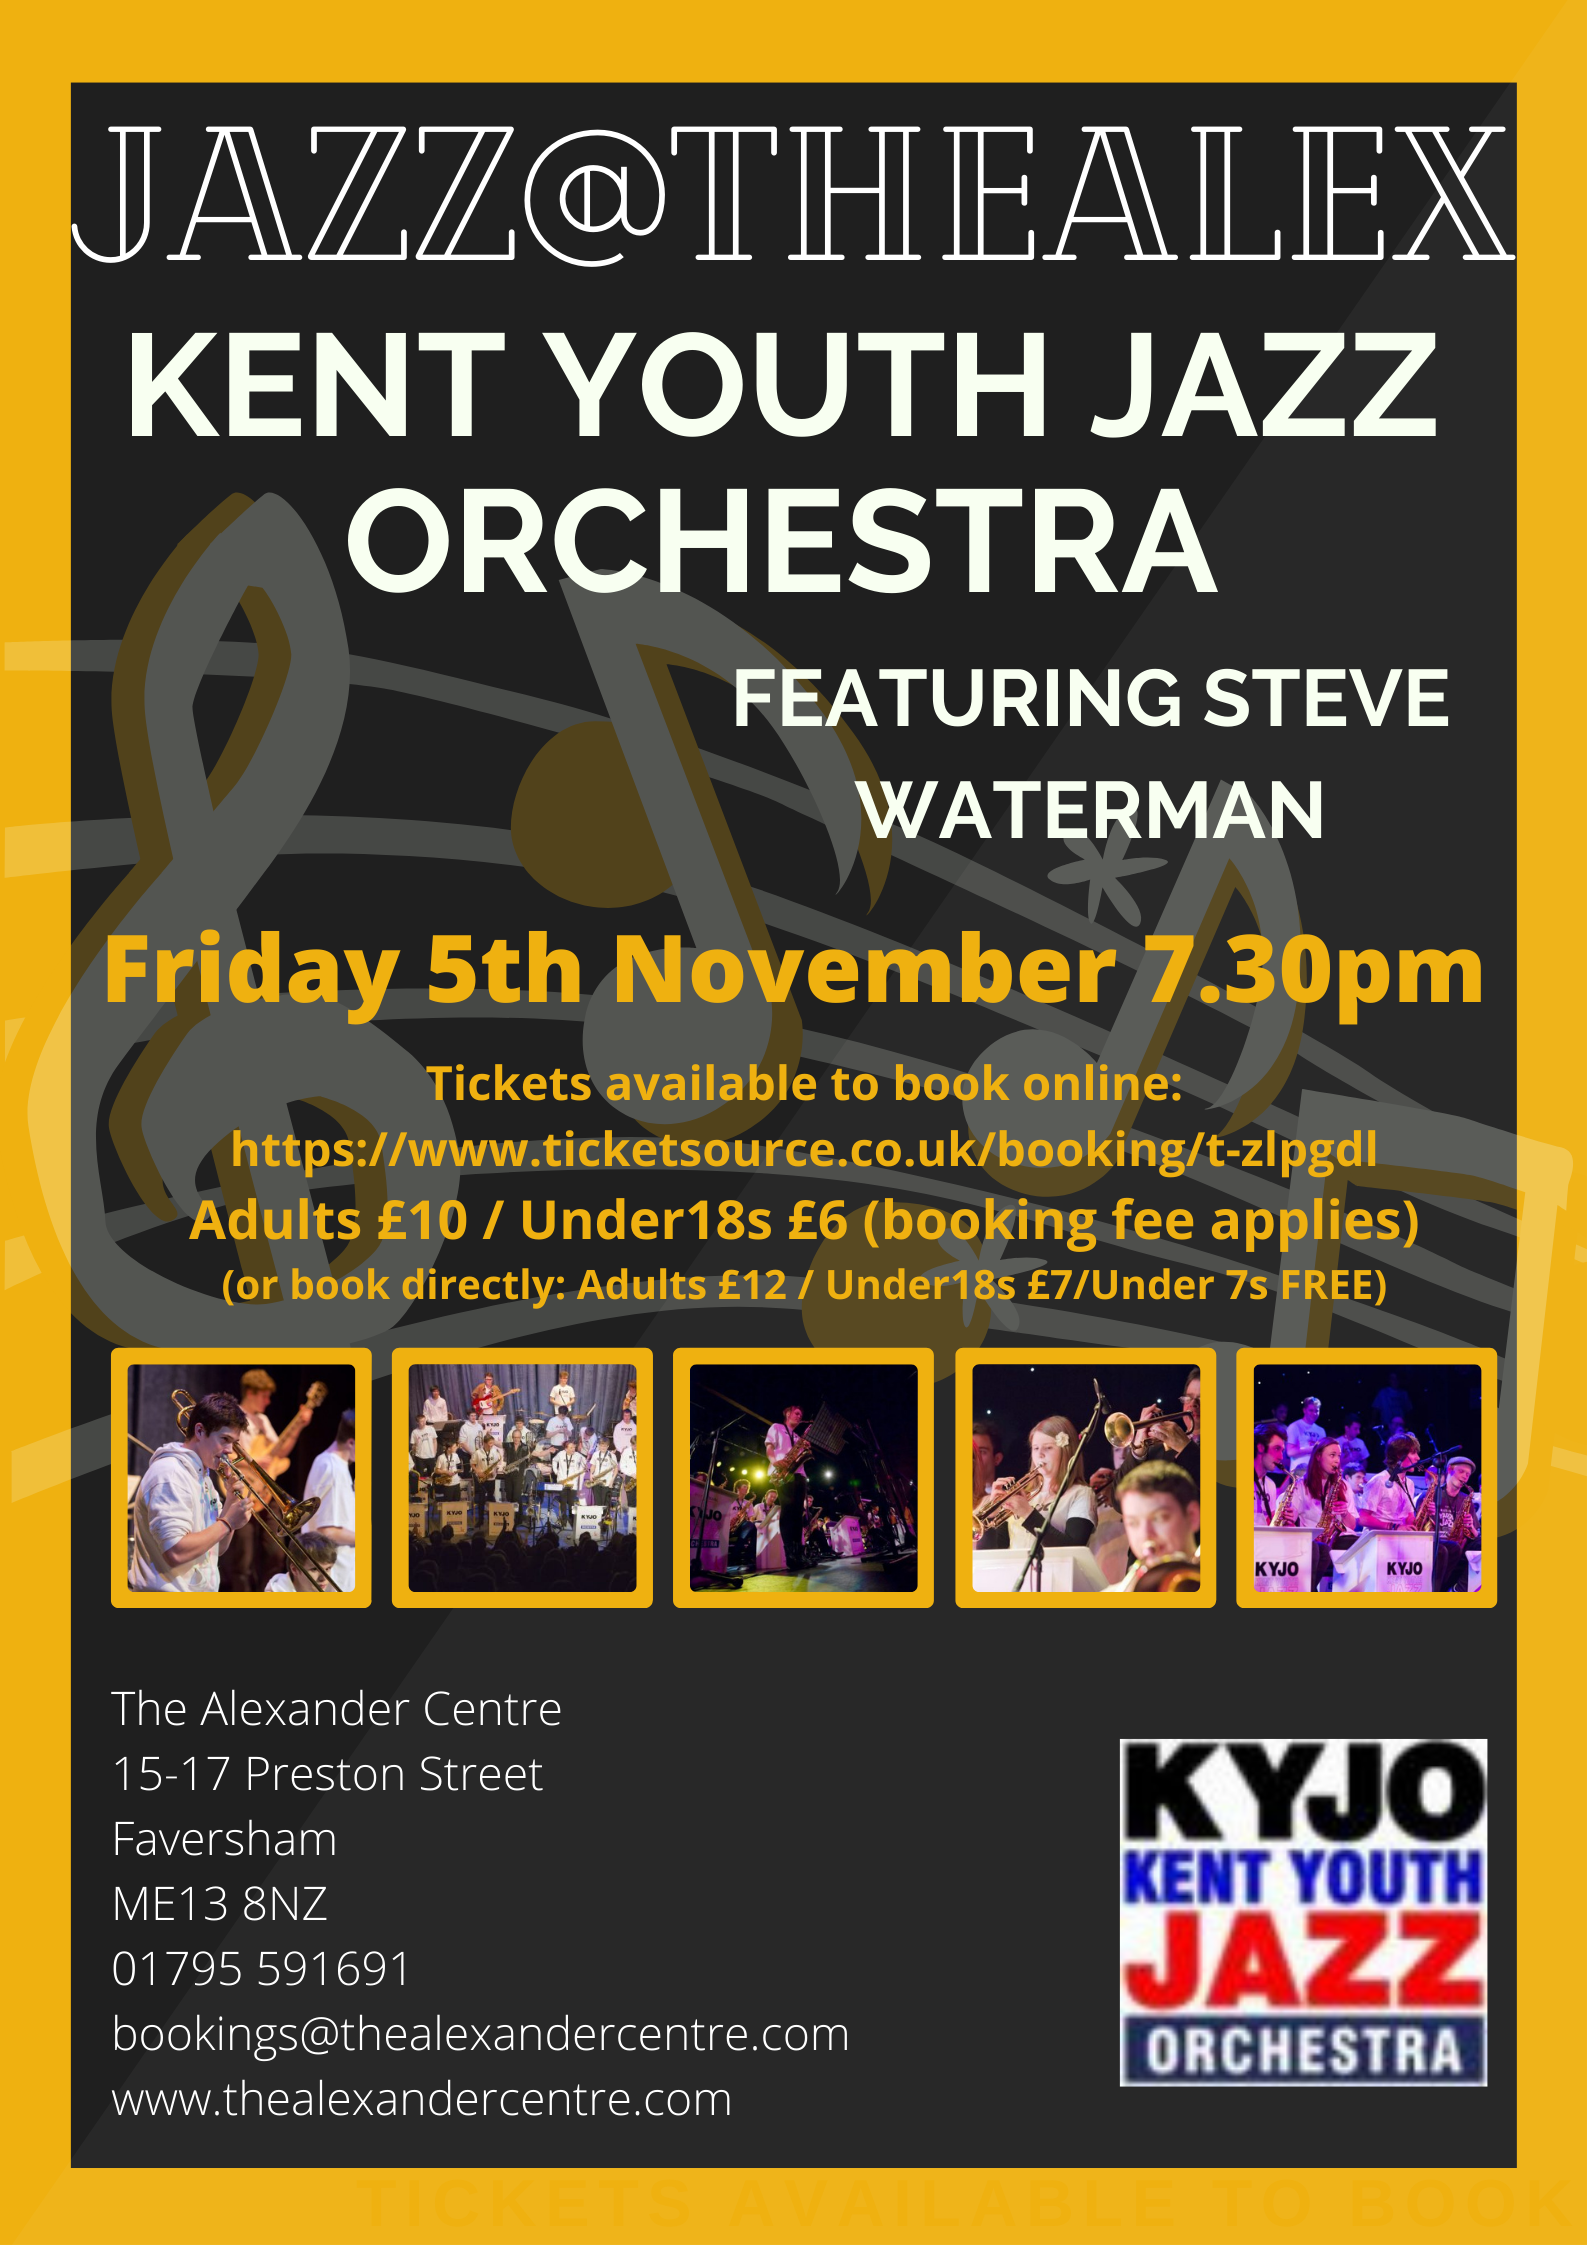 Jazz@TheAlex - Kent Youth Jazz Orchestra with Steve Waterman